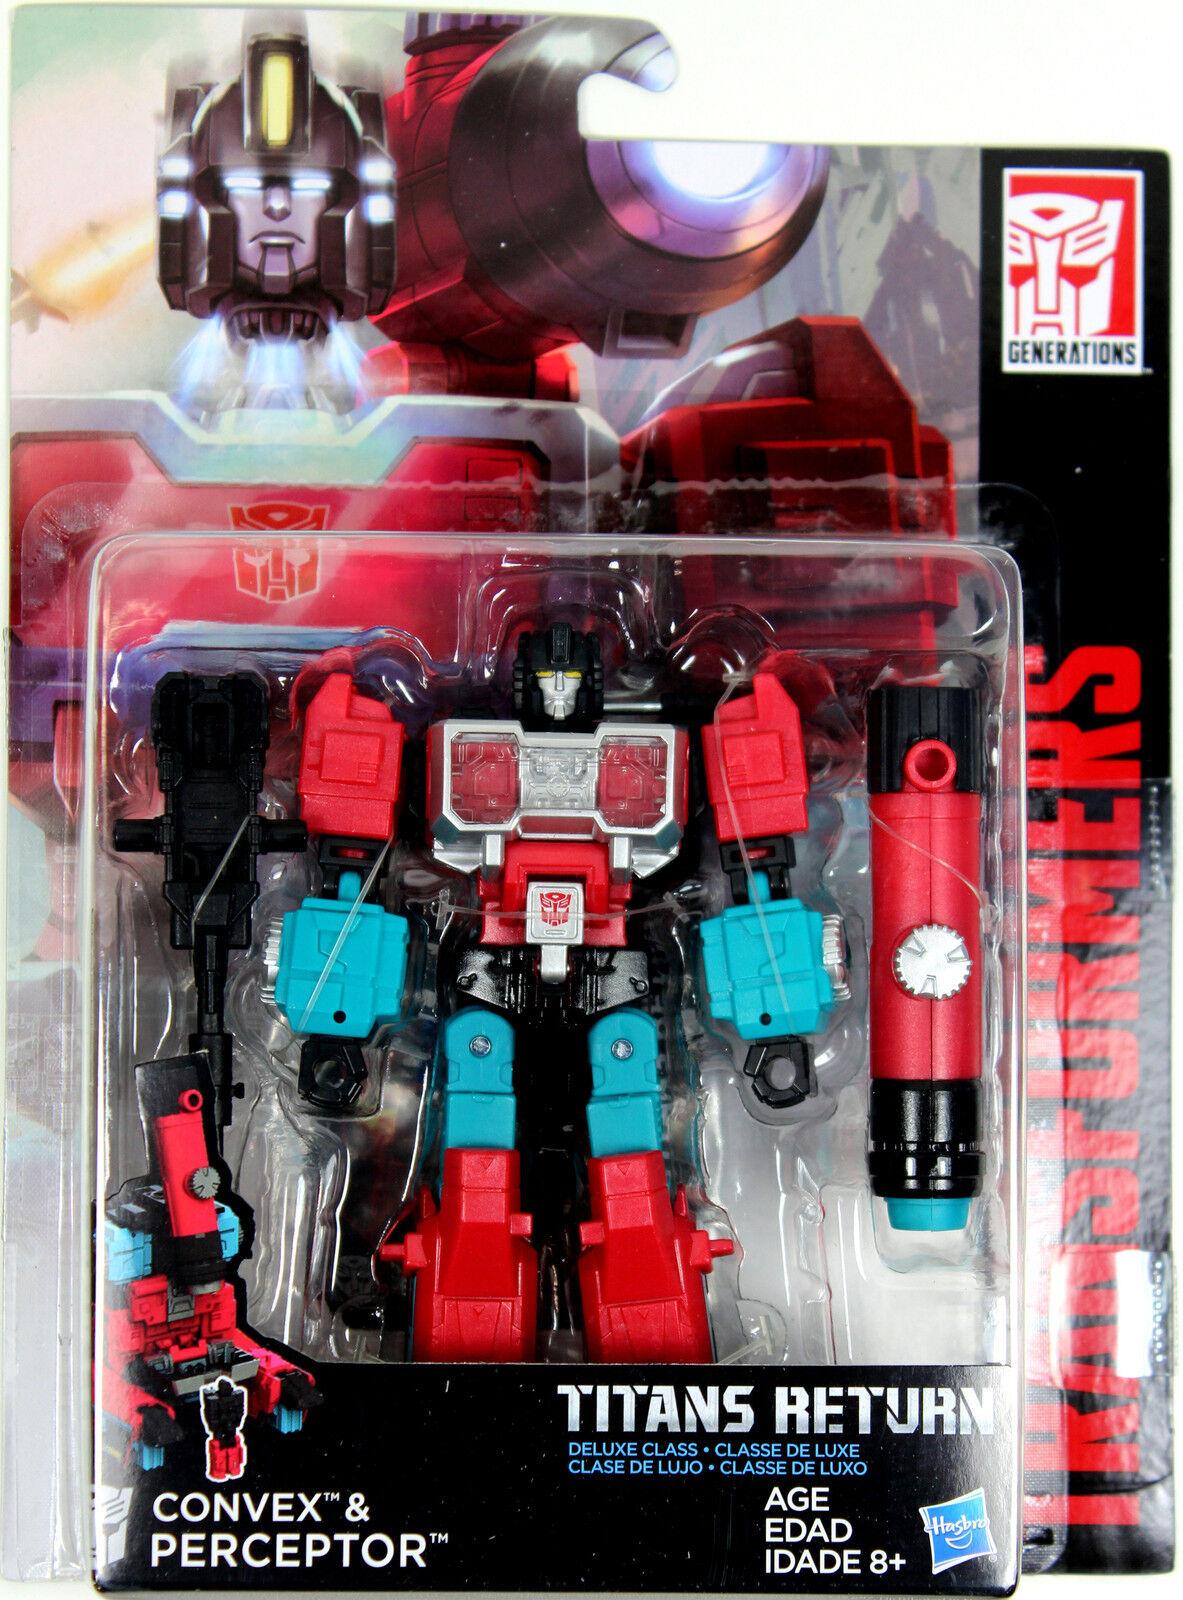 Transformers: Titans Return  PERCEPTOR & CONVEX ACTION FIGURES  Deluxe Class